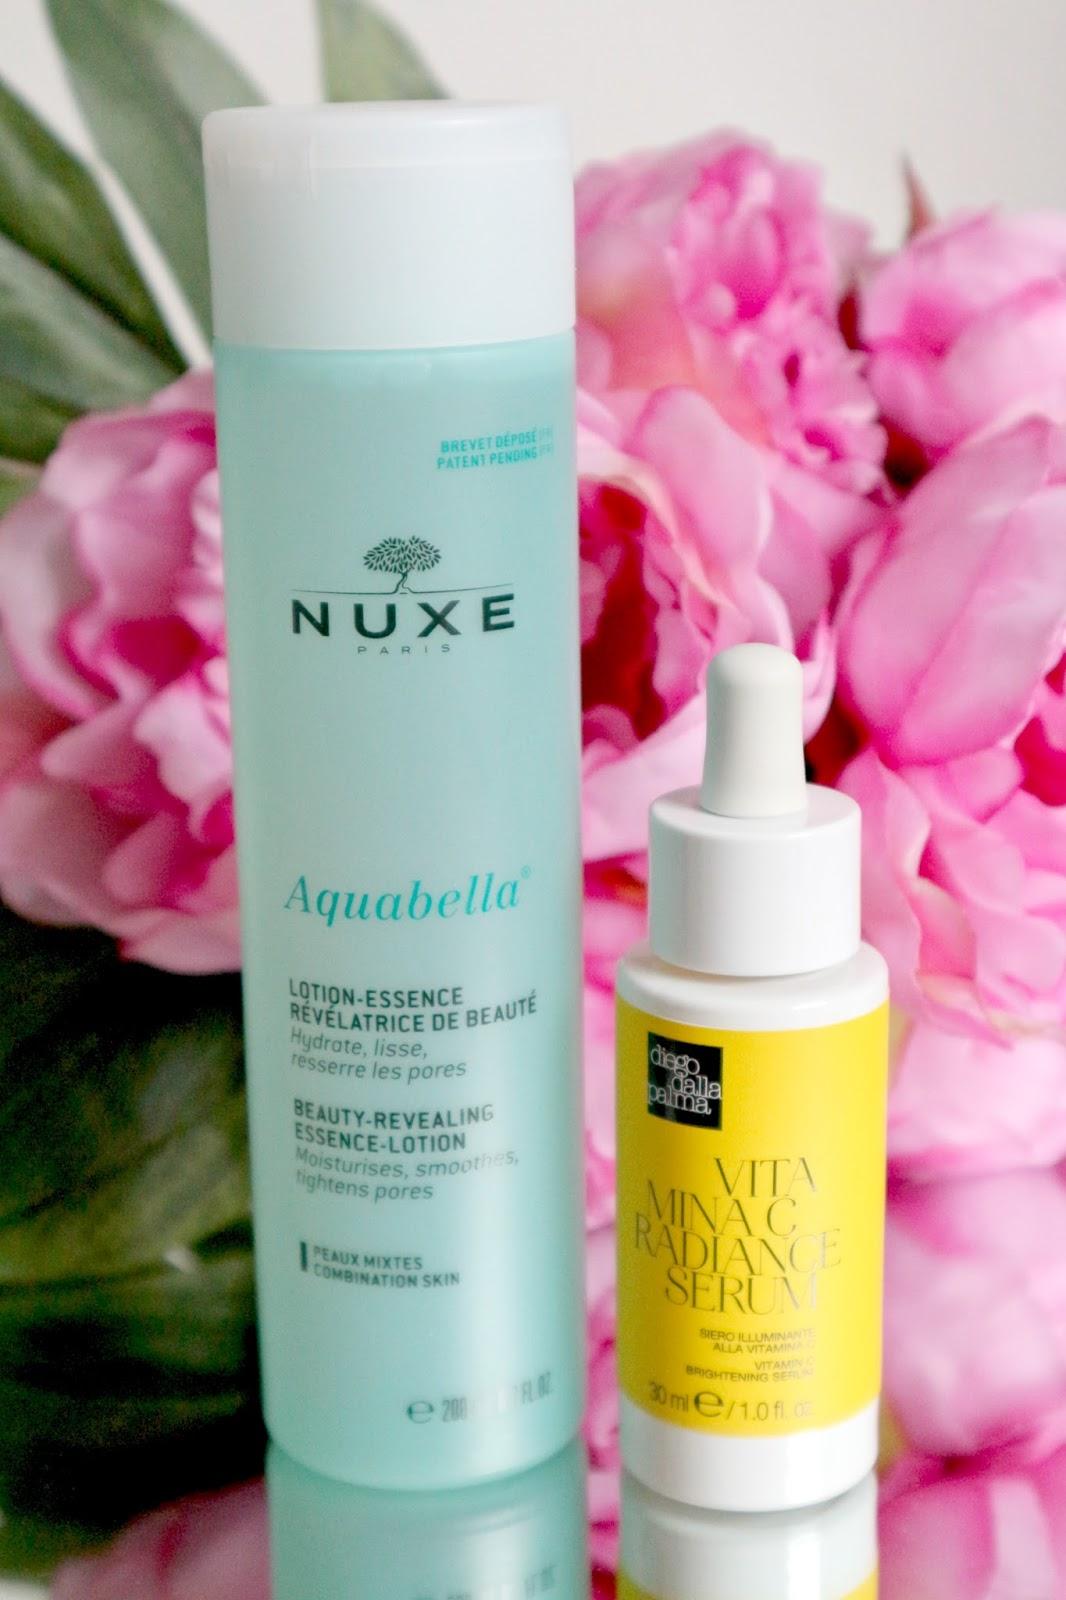 nuxe aquabella review